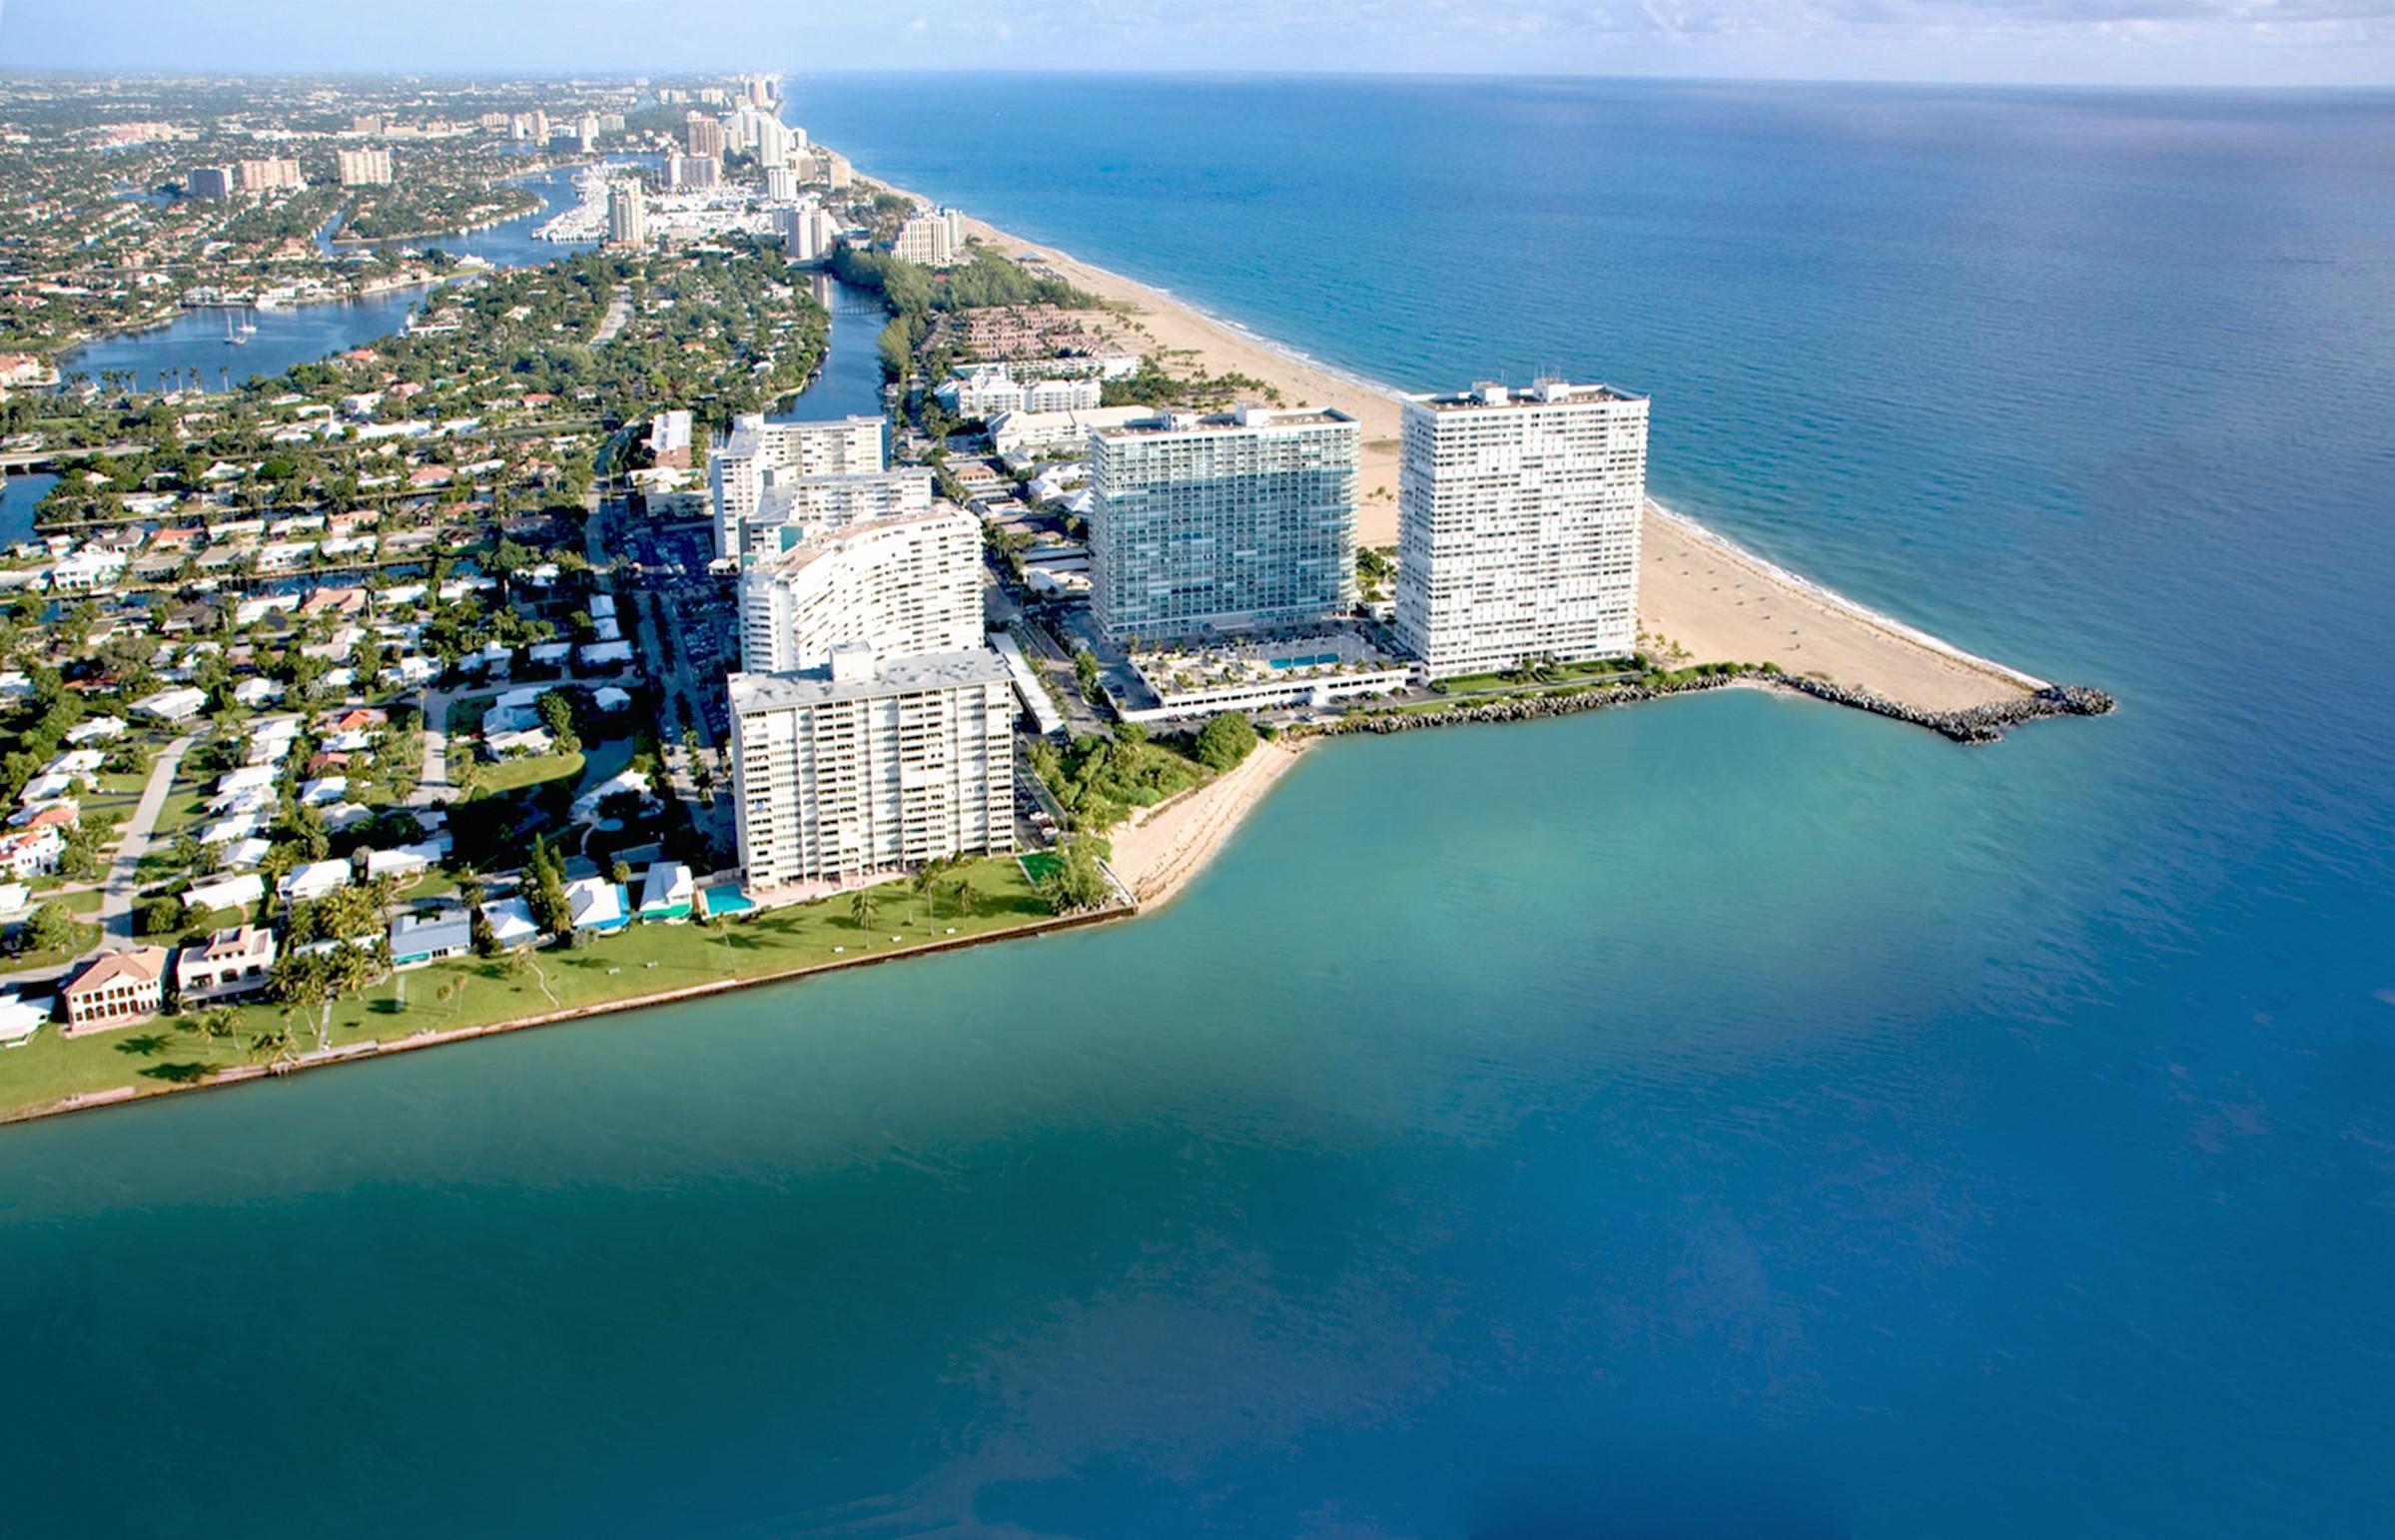 Property For Sale at 2100 S. Ocean Lane Unit# 1610